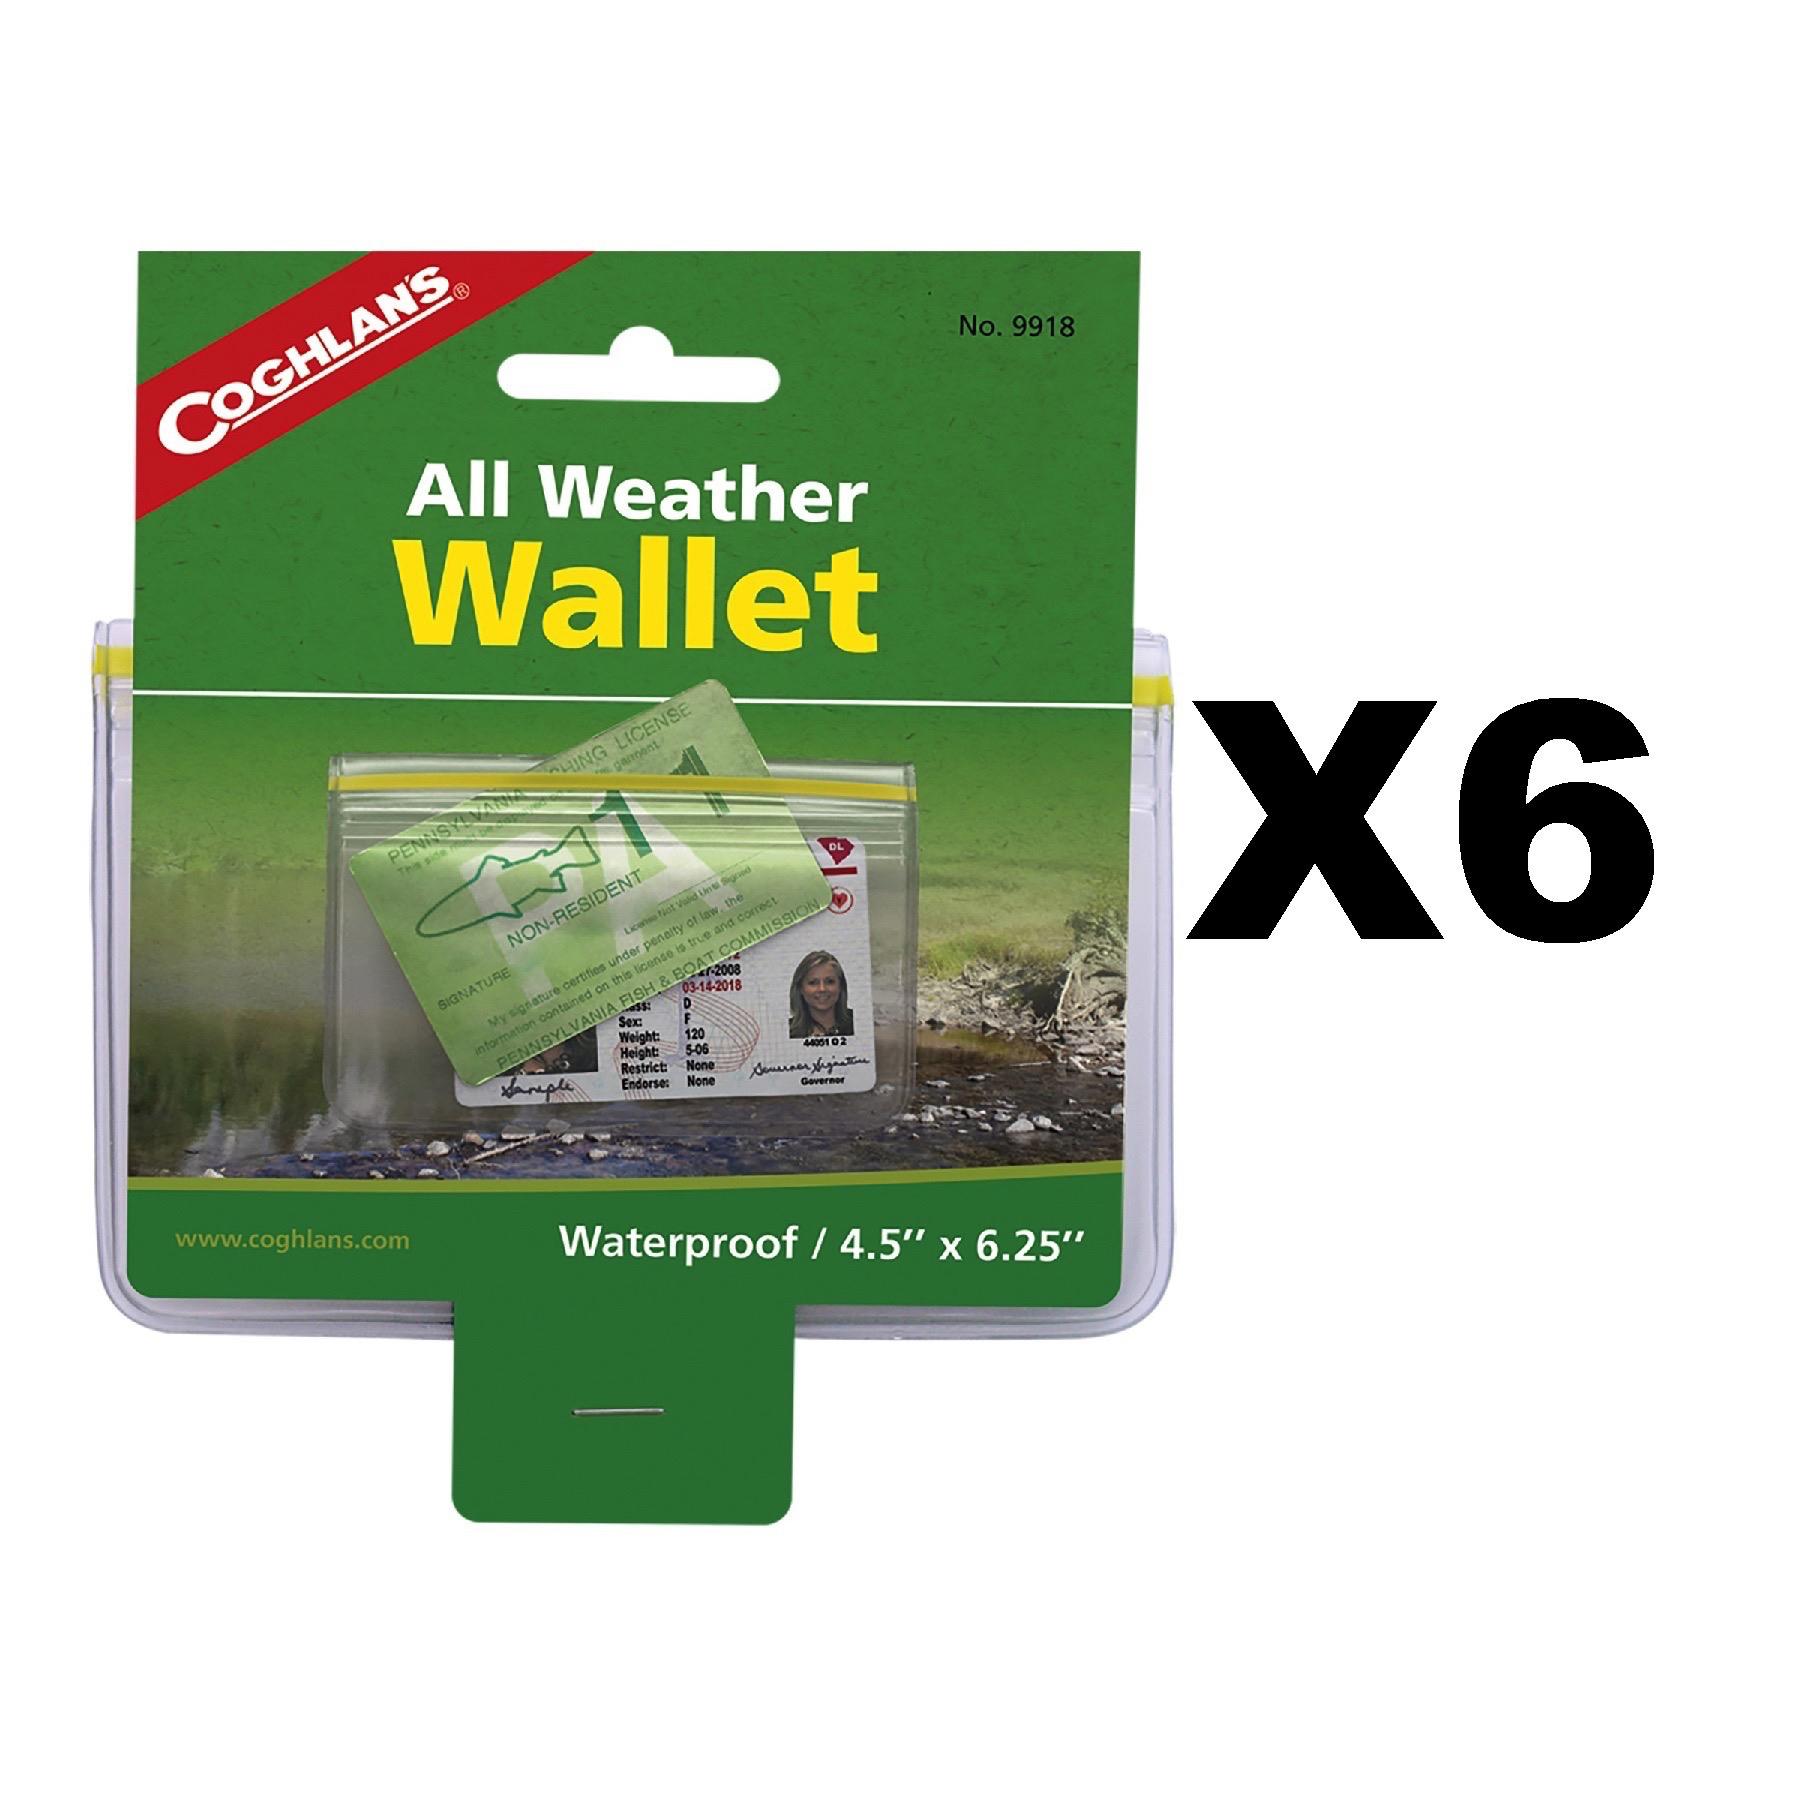 "Coghlan/'s All-Weather Wallet Waterproof Zip-Lock Dry Pouch Outdoor Gear 4.5x6.5/"""